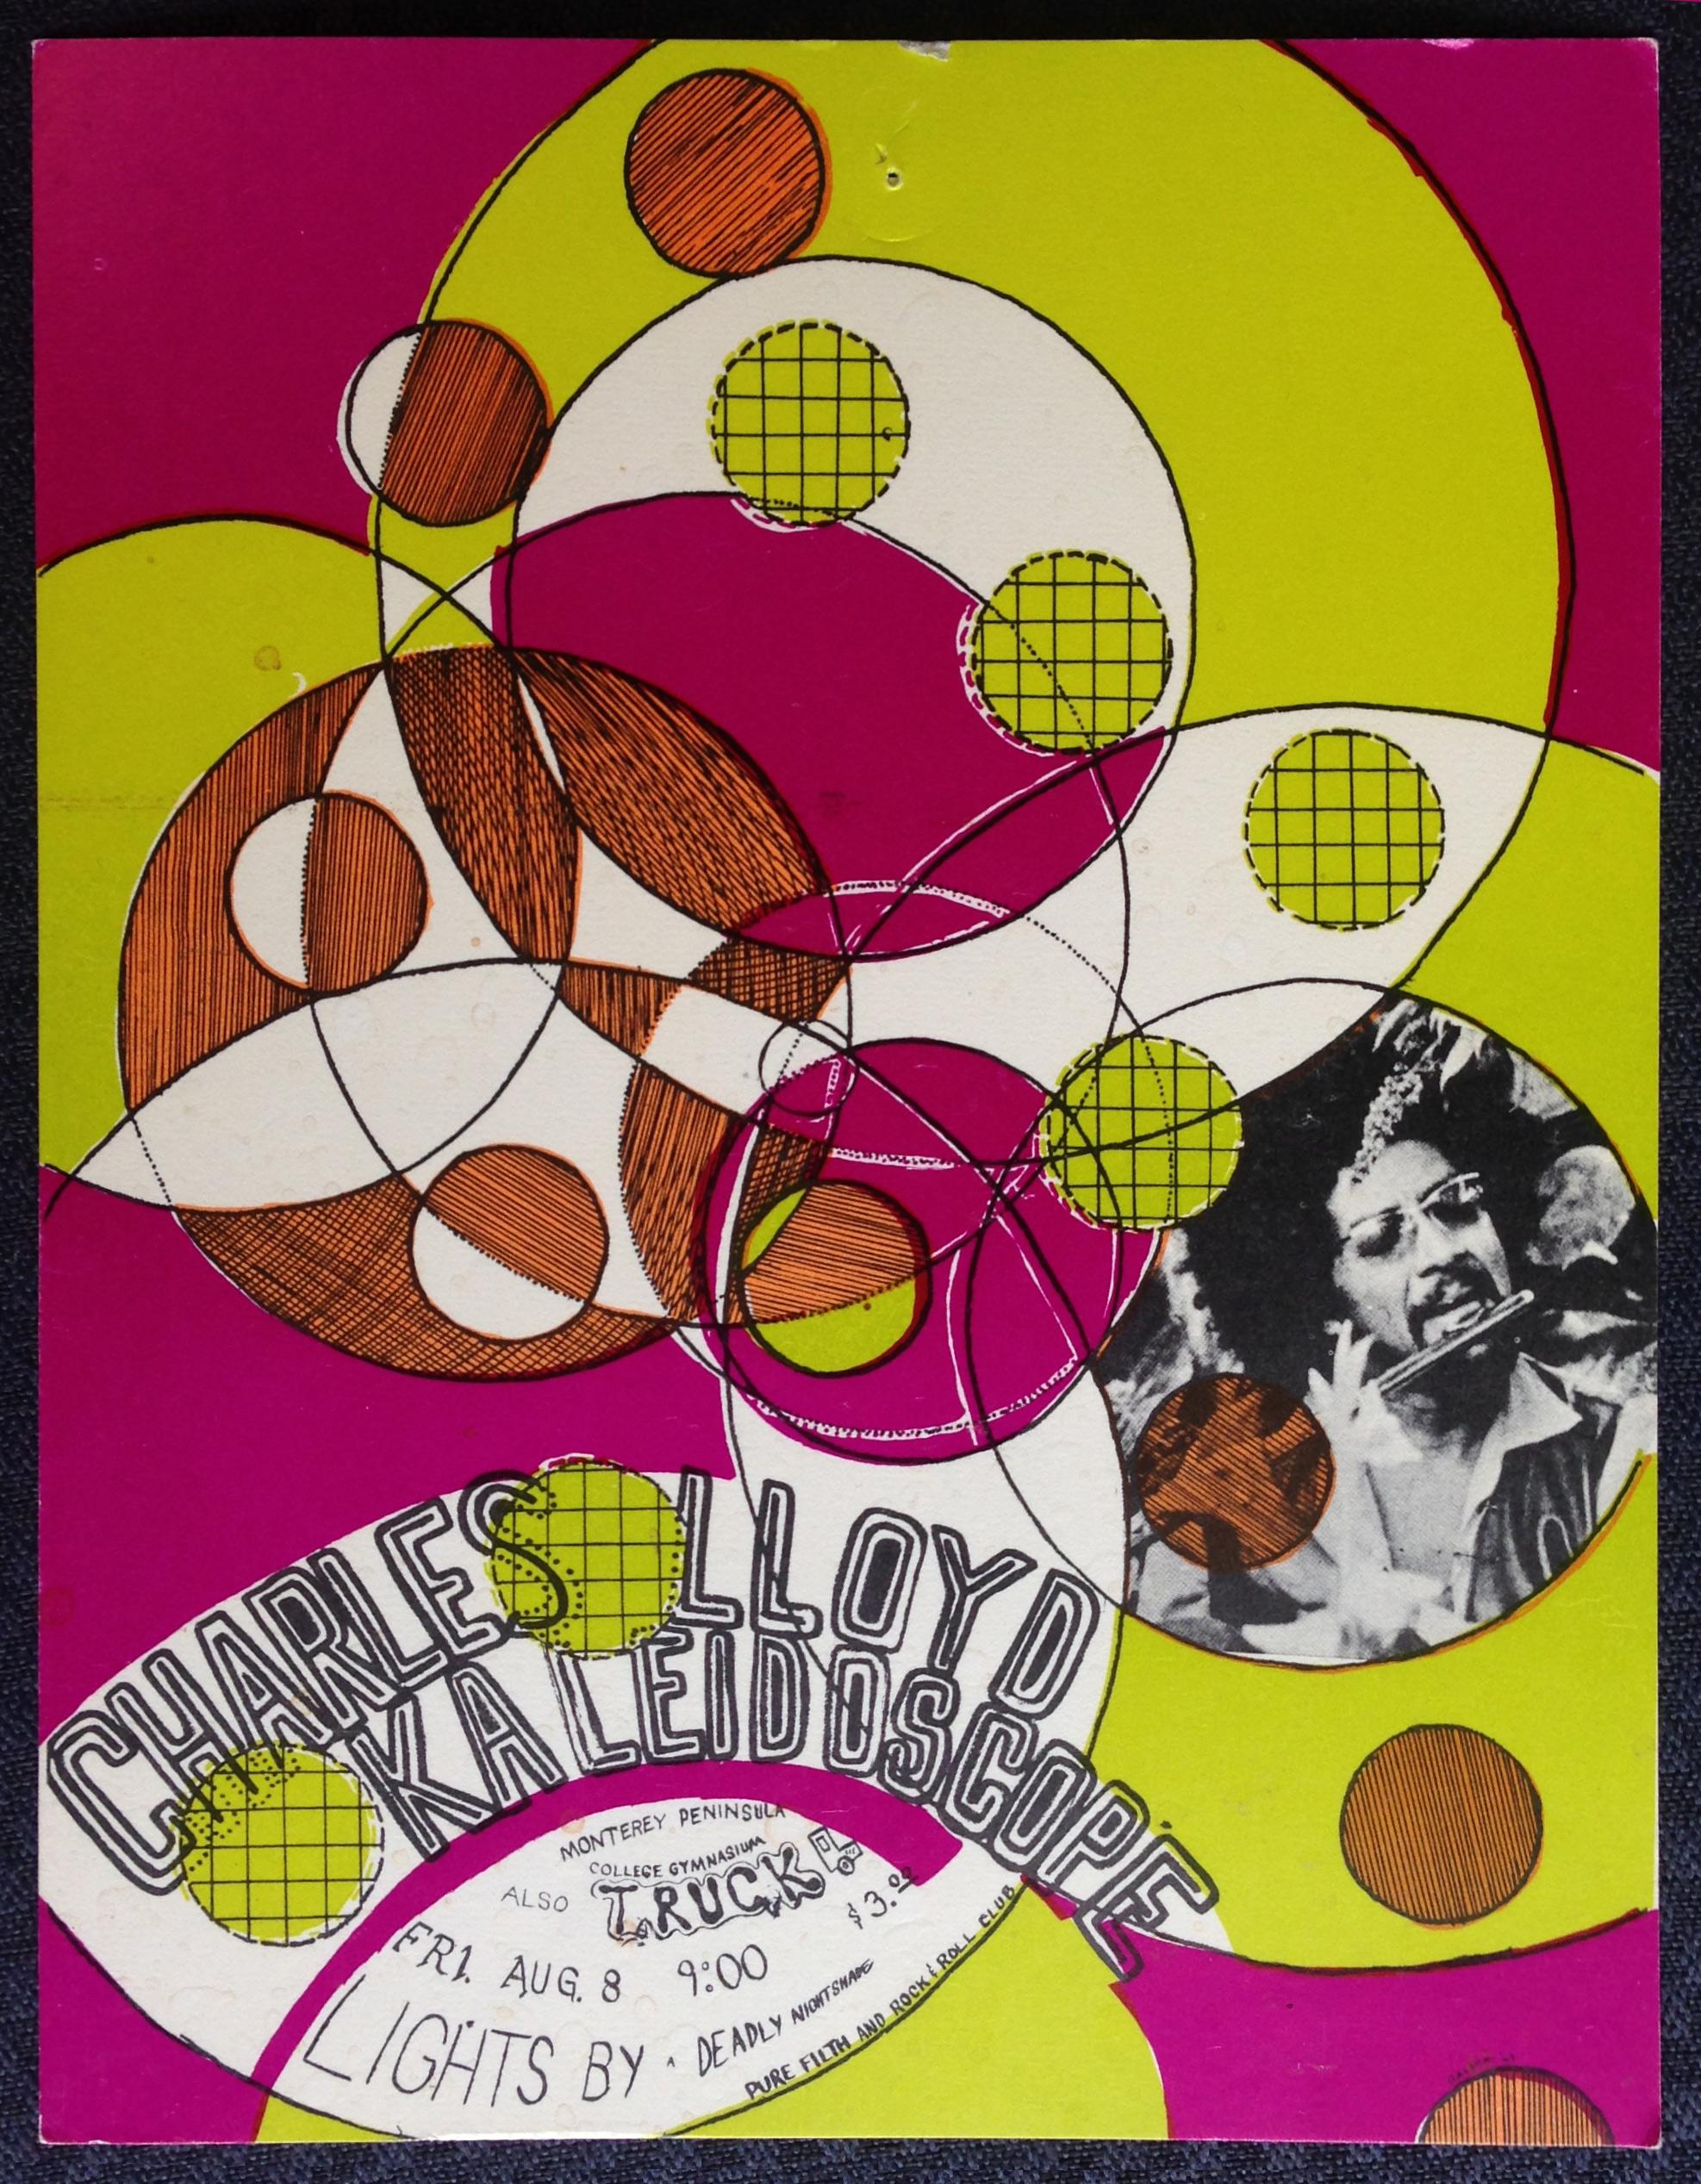 Charles Lloyd - Kaleidoscope